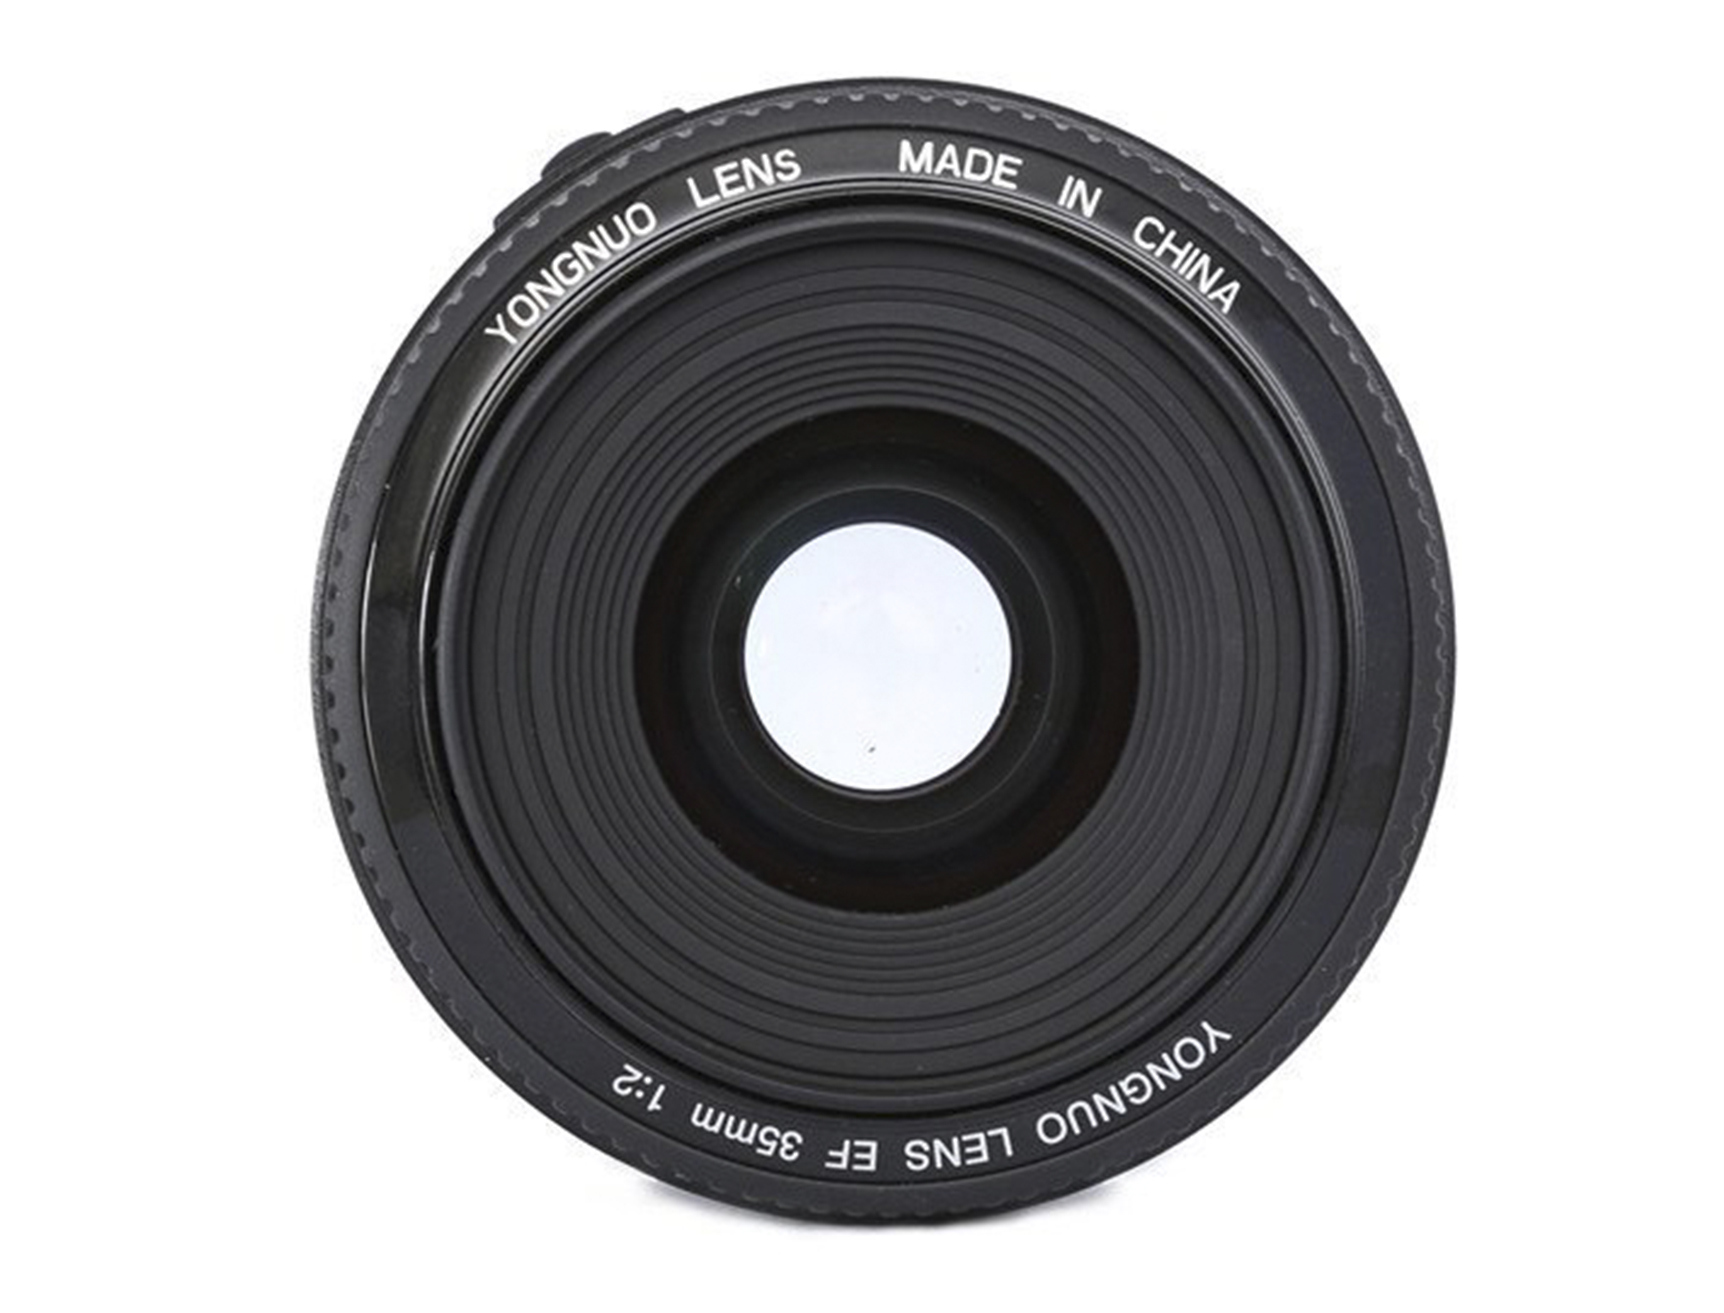 Budget Yongnuo 35mm f2 aperture Cameraplex